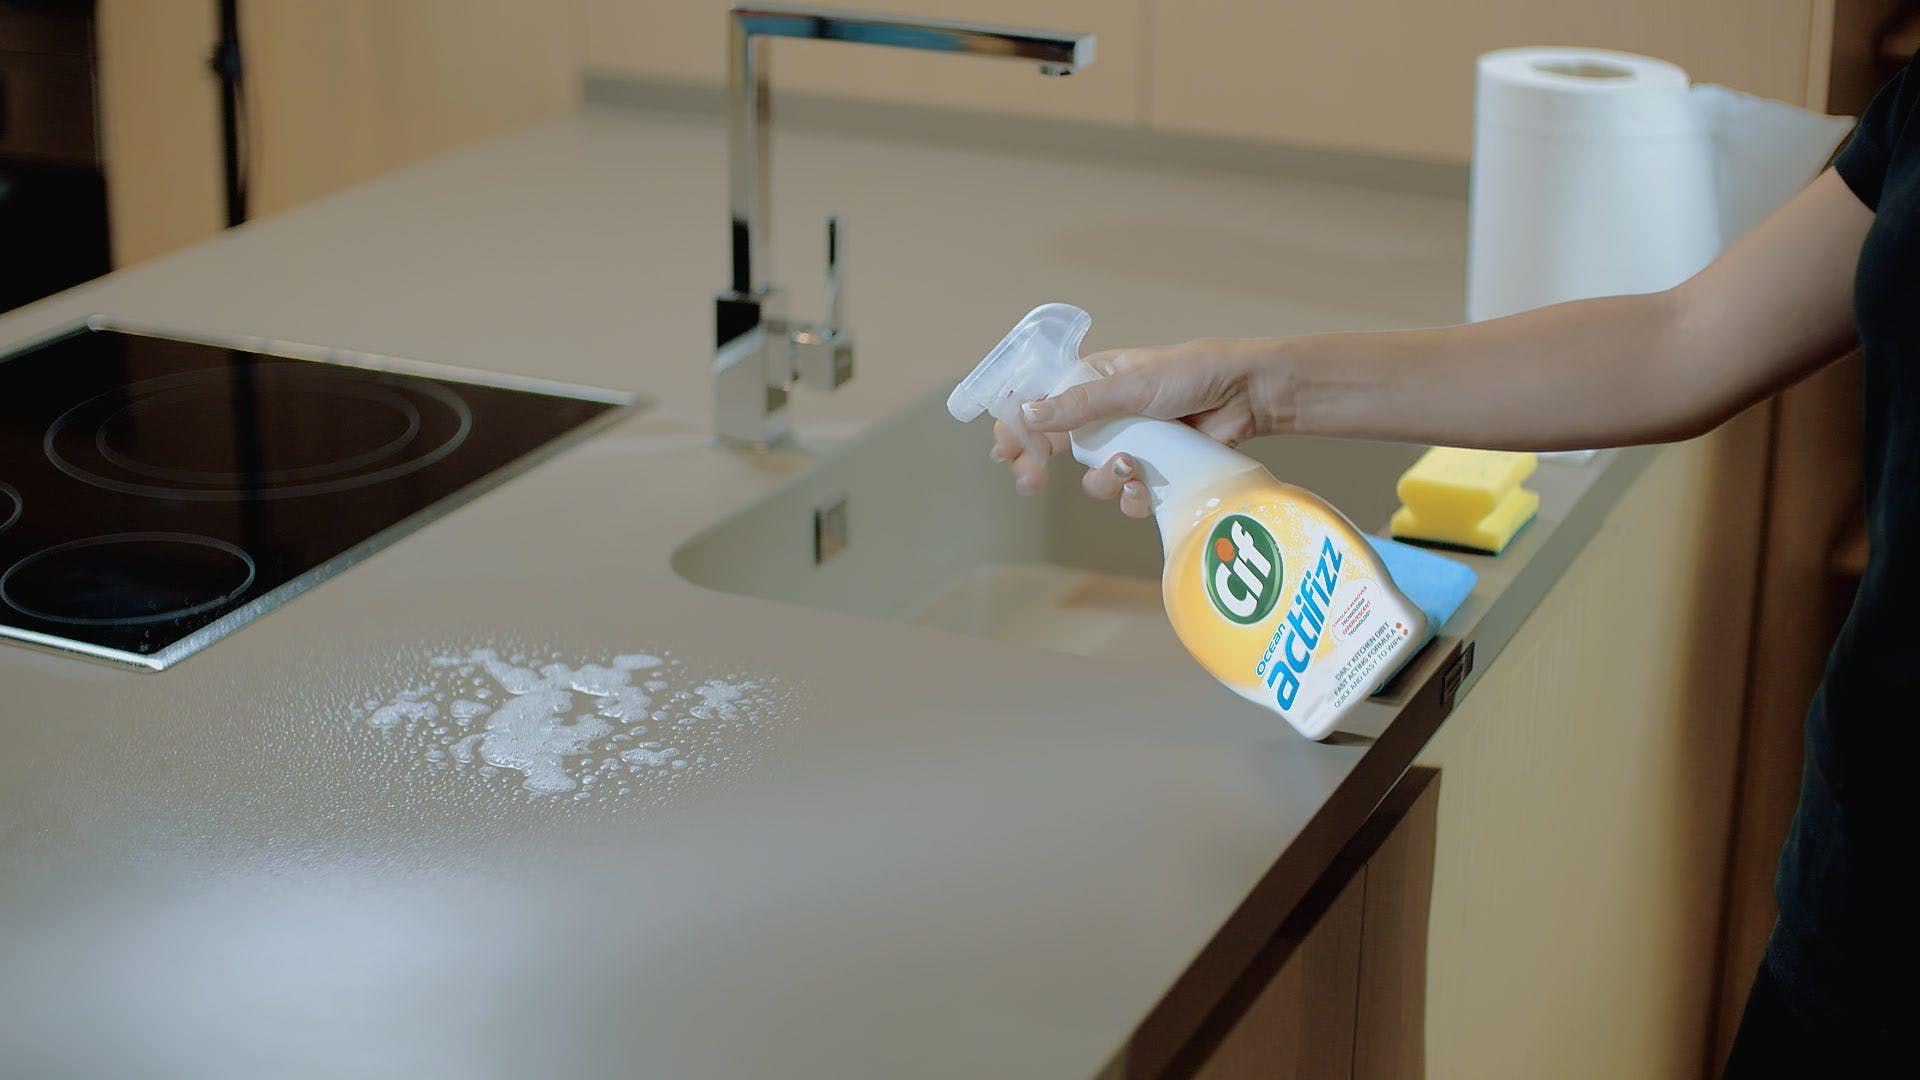 Silestone quartz surfaces and countertop maintenance